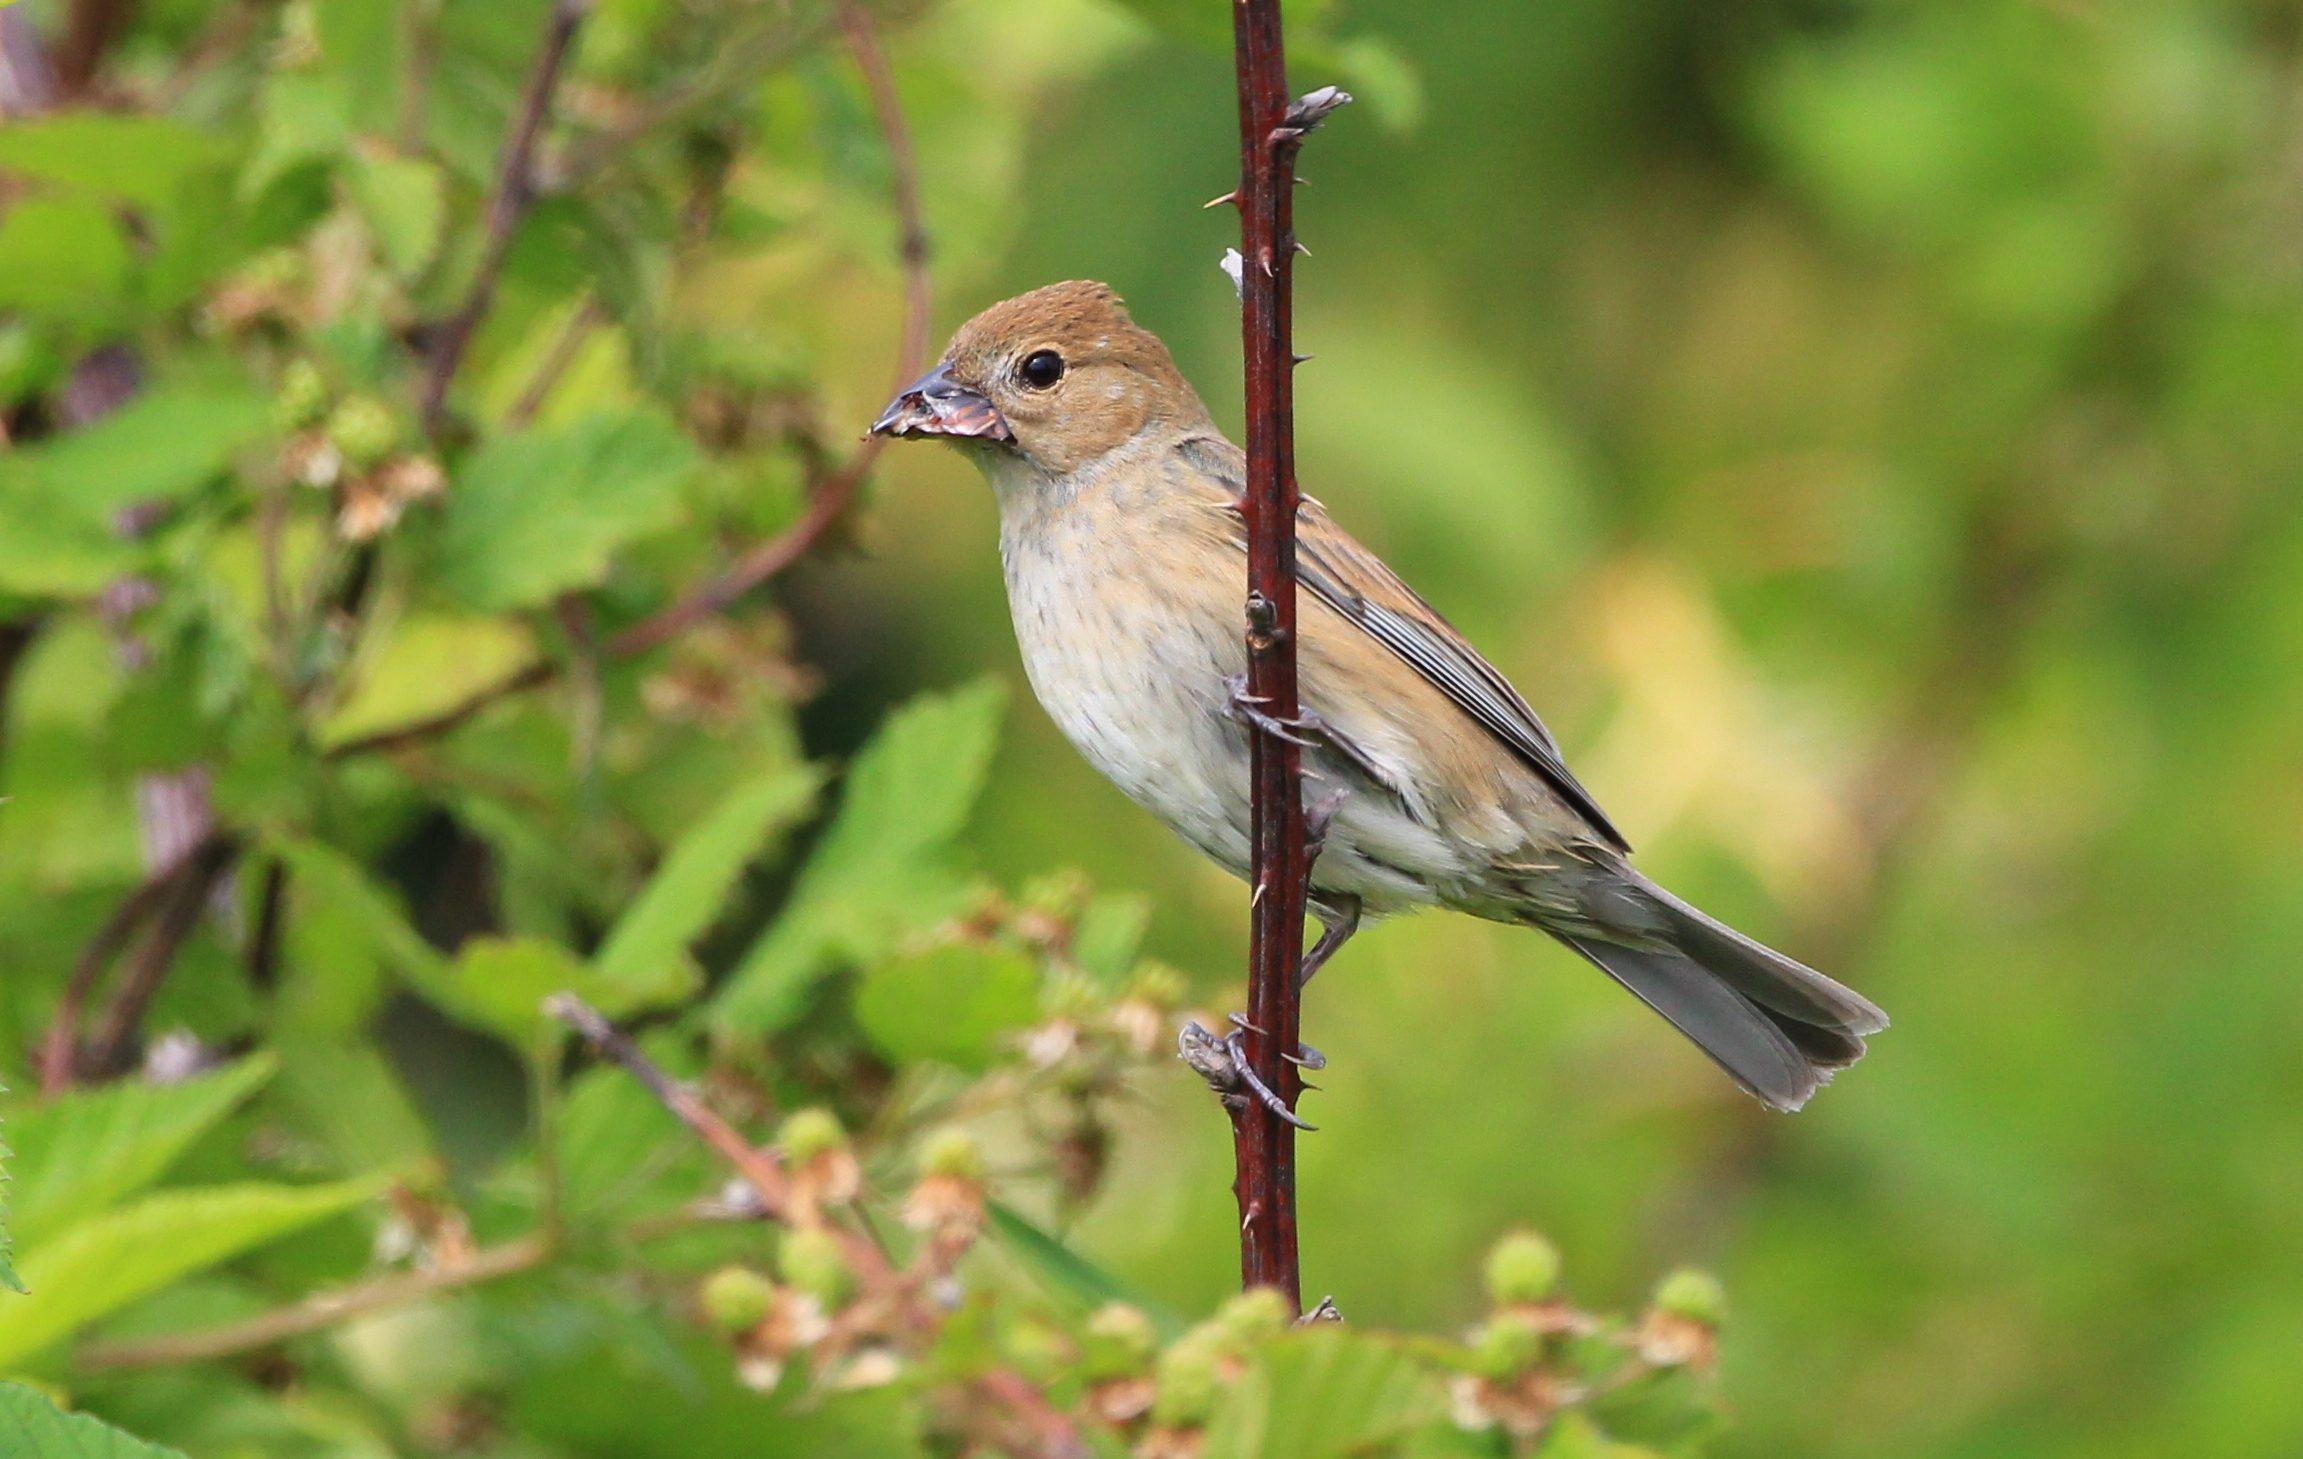 Beak oddity on female indigo bunting birds and blooms